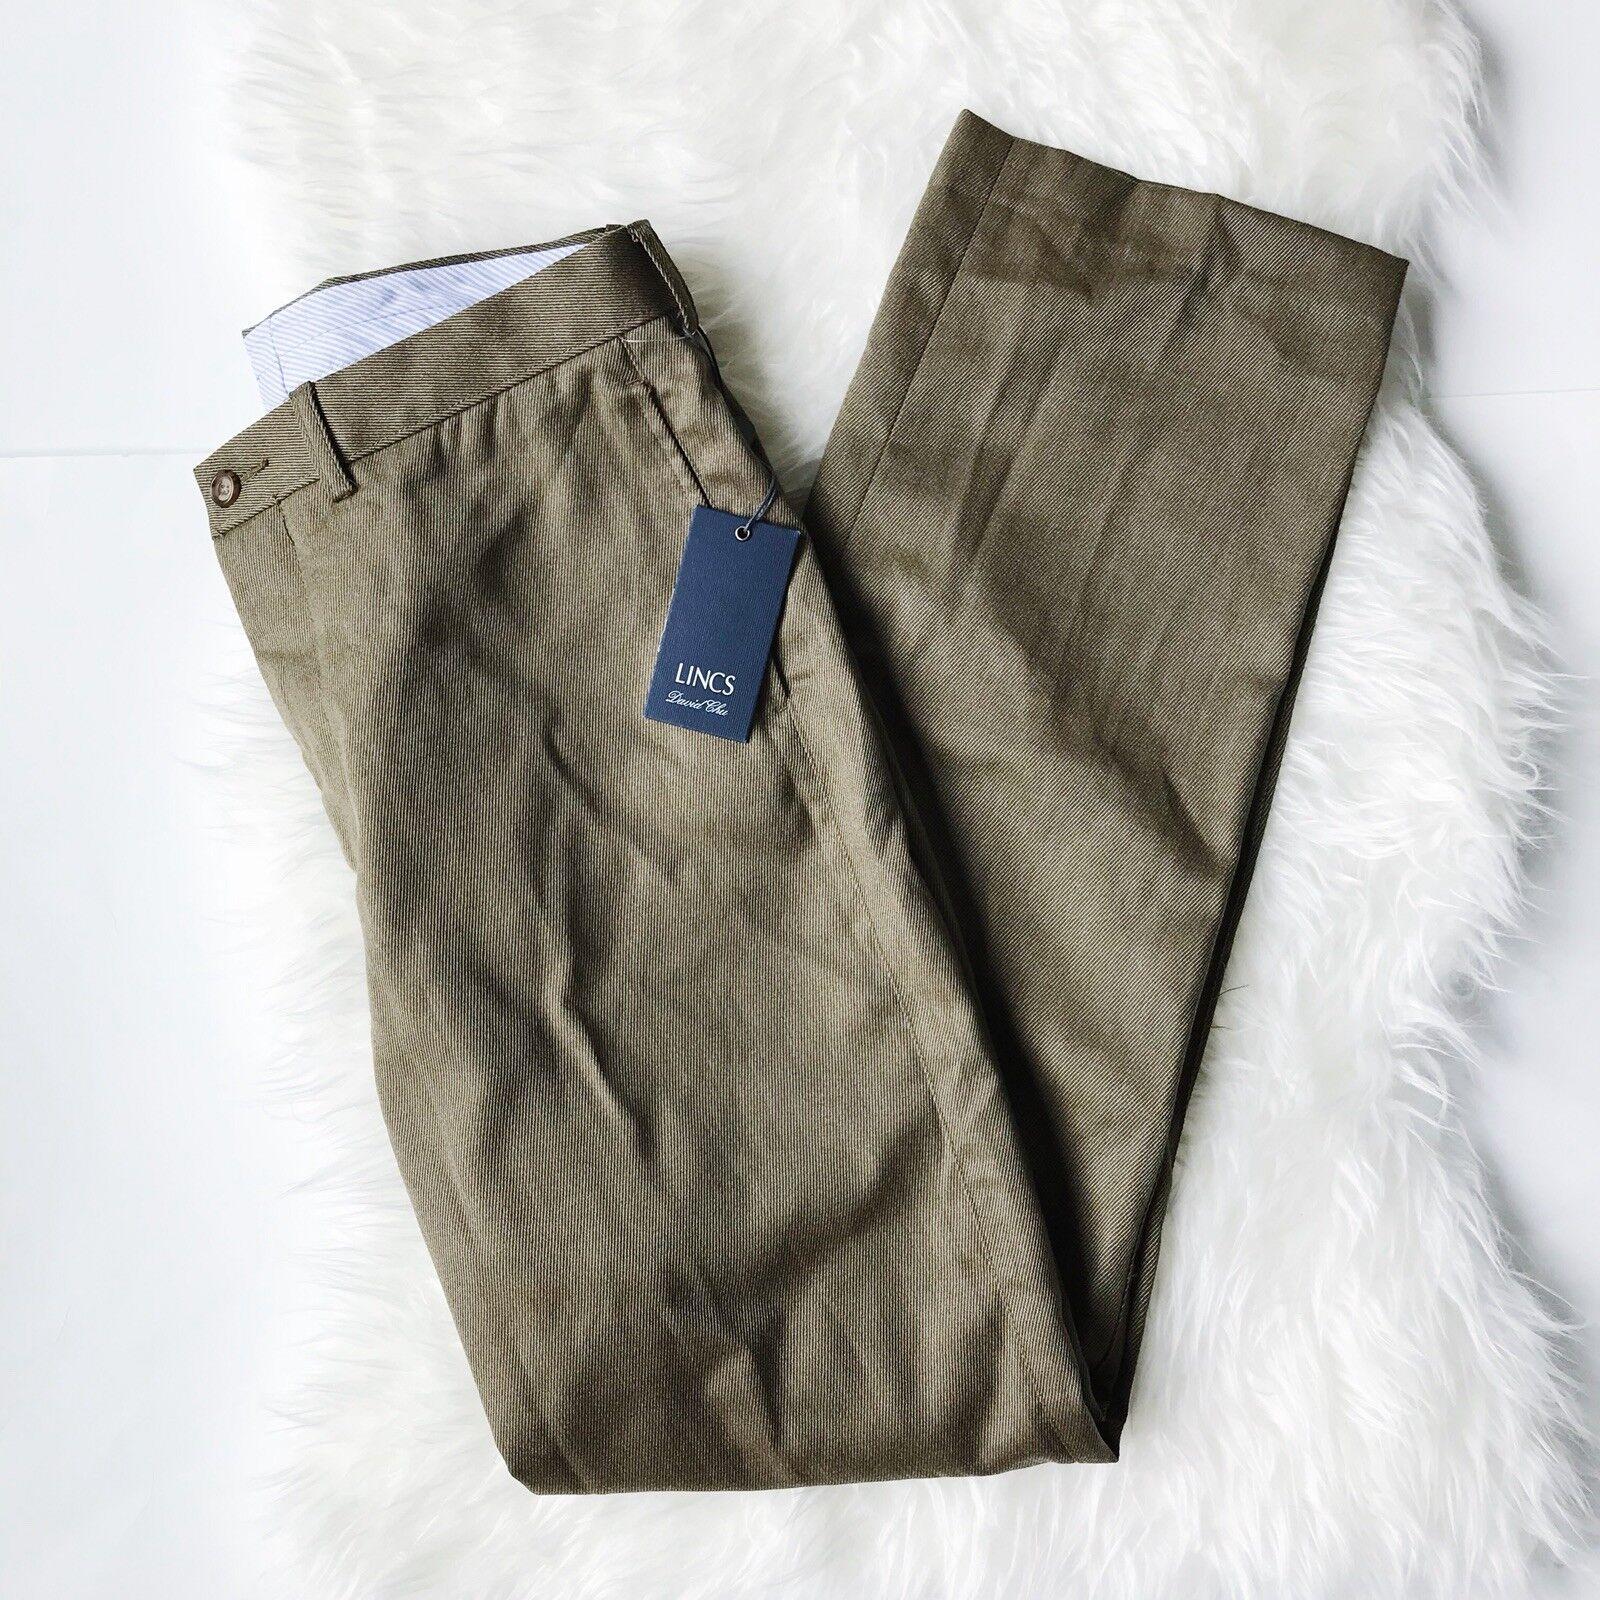 NWT  Lincs David Chu Wool Pants Size 34 in Fall Olive Style PF84121